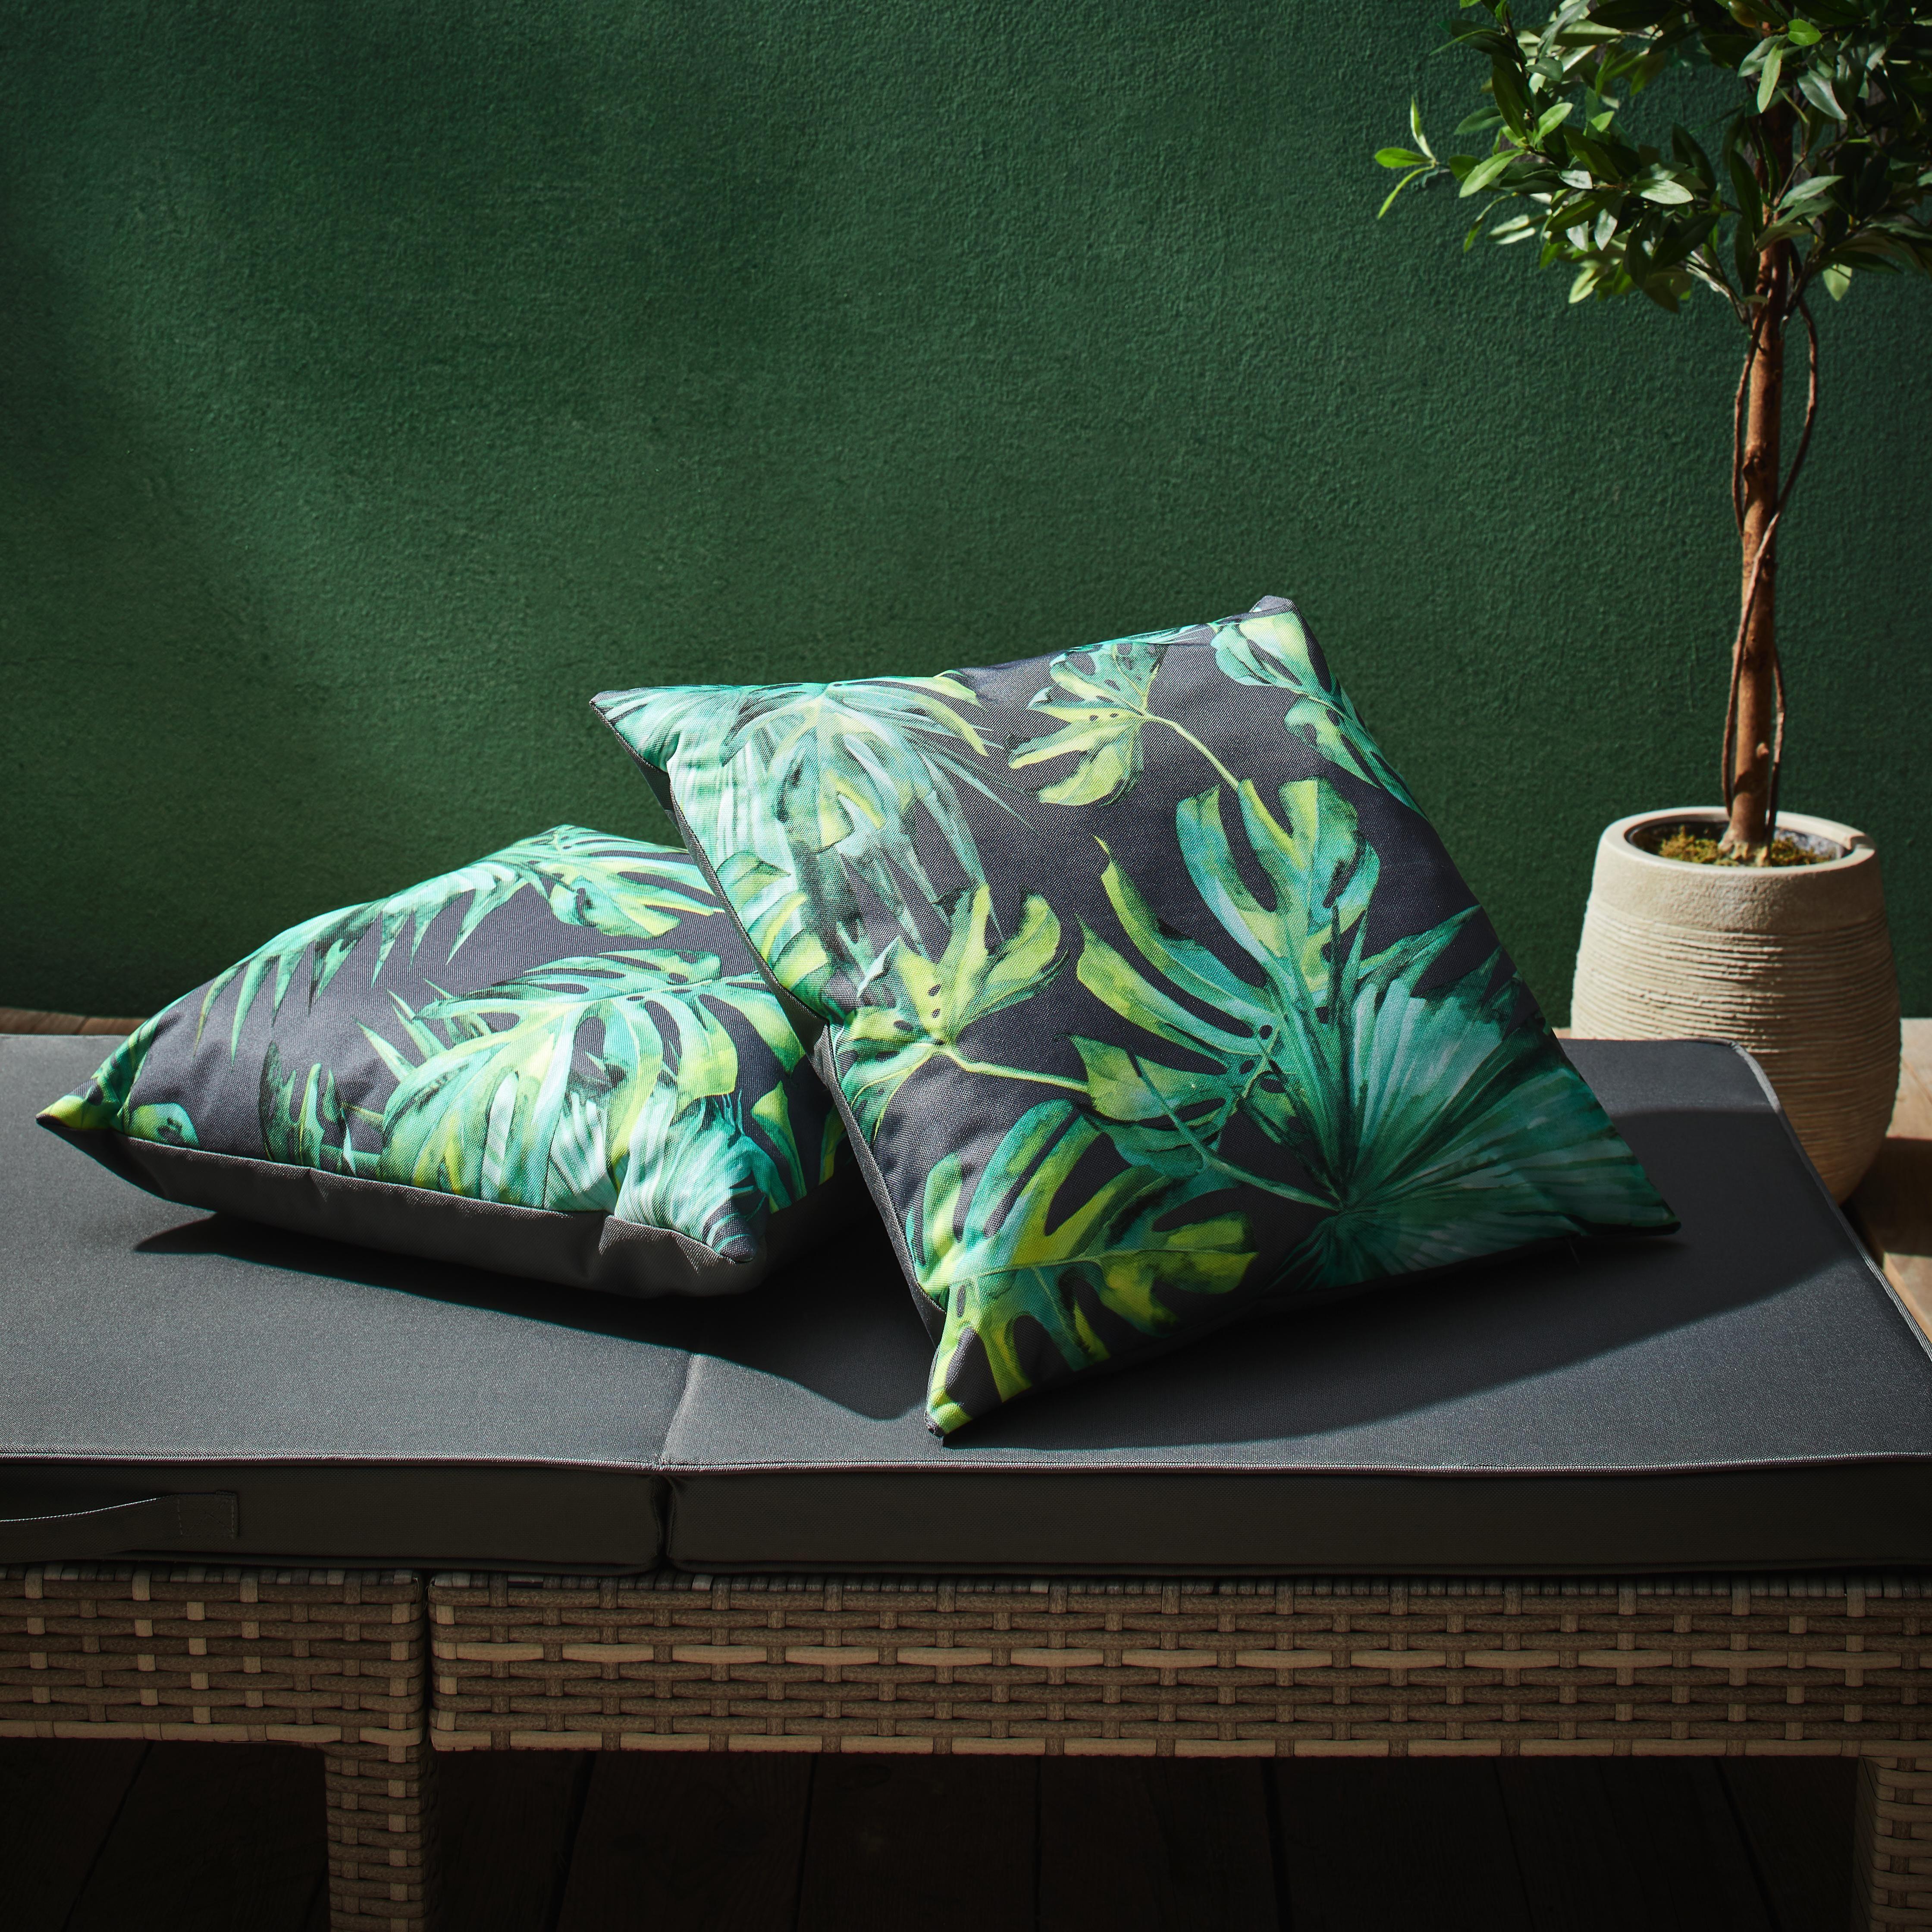 Outdoorkissen Polly  ca. 45x45cm - Dunkelgrau/Grün, MODERN, Textil (45/45cm) - Mömax modern living